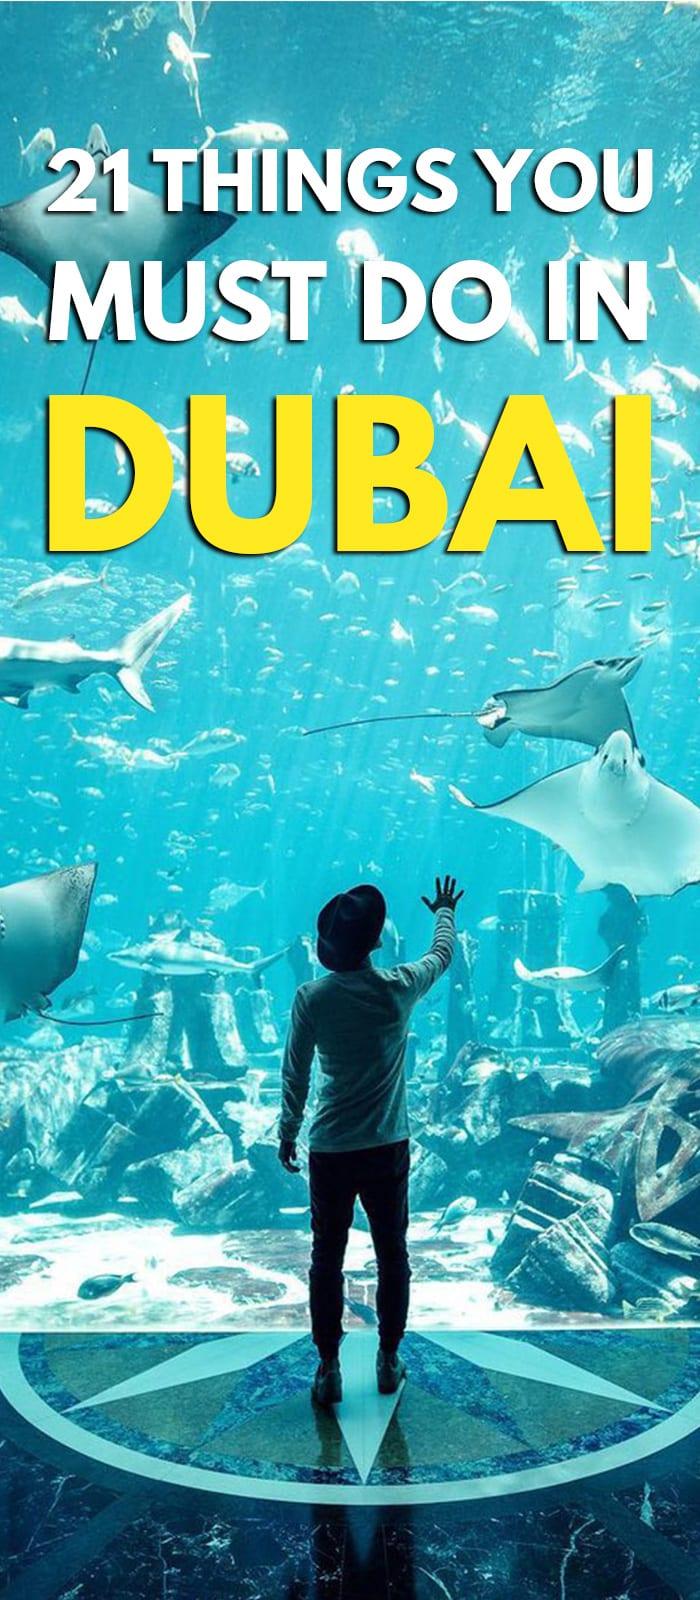 dubai mall aquarium - entry fees online booking package